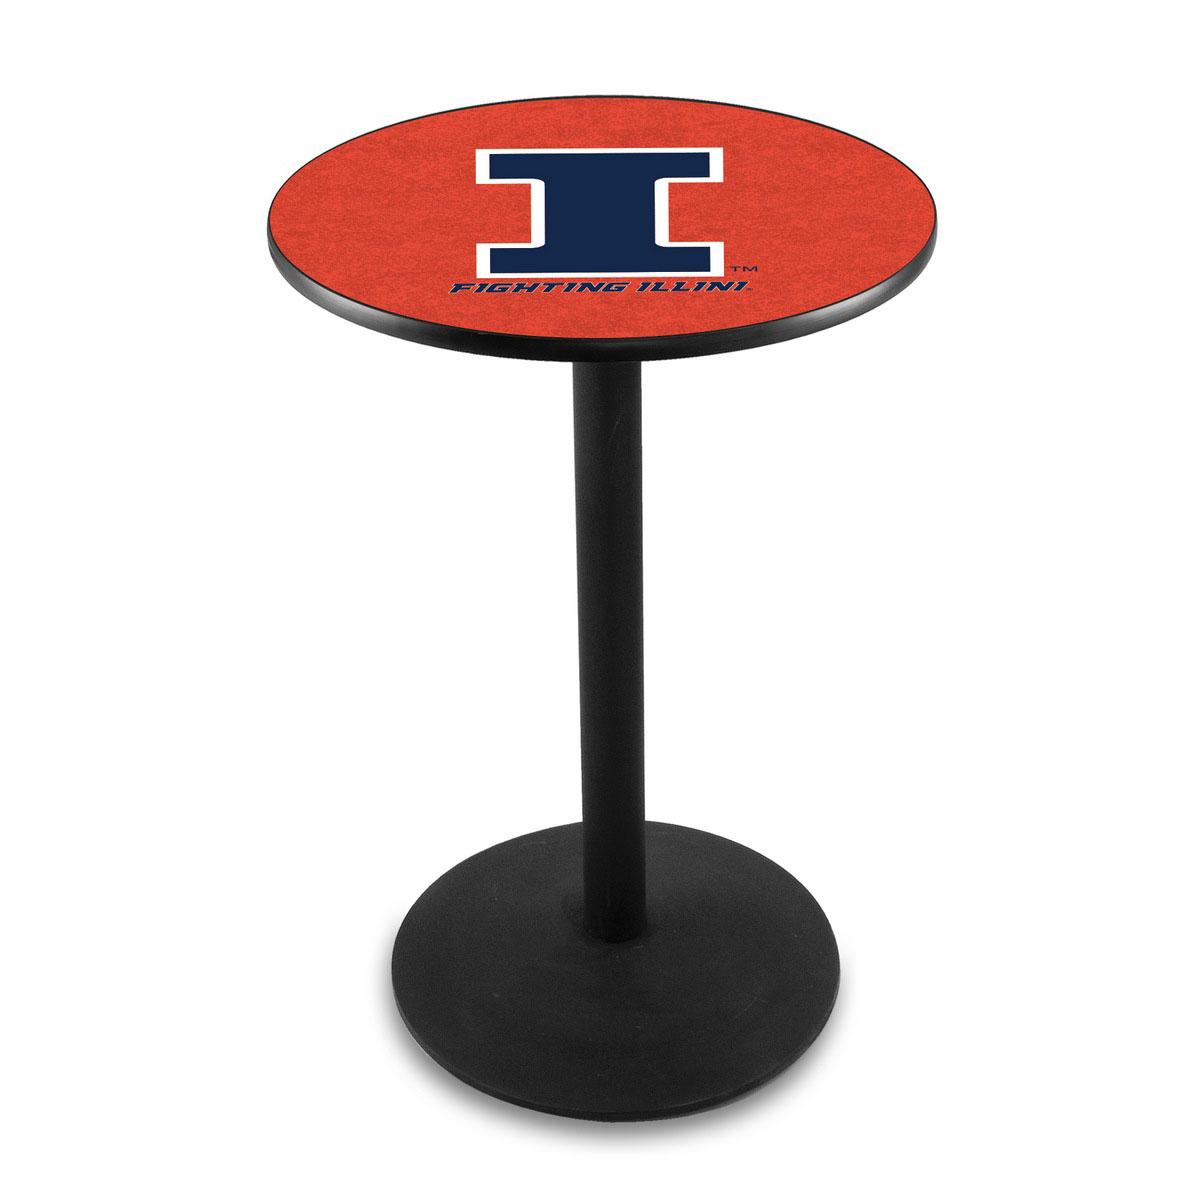 Lovable University Illinois Logo Pub Bar Table Round Stand Product Photo